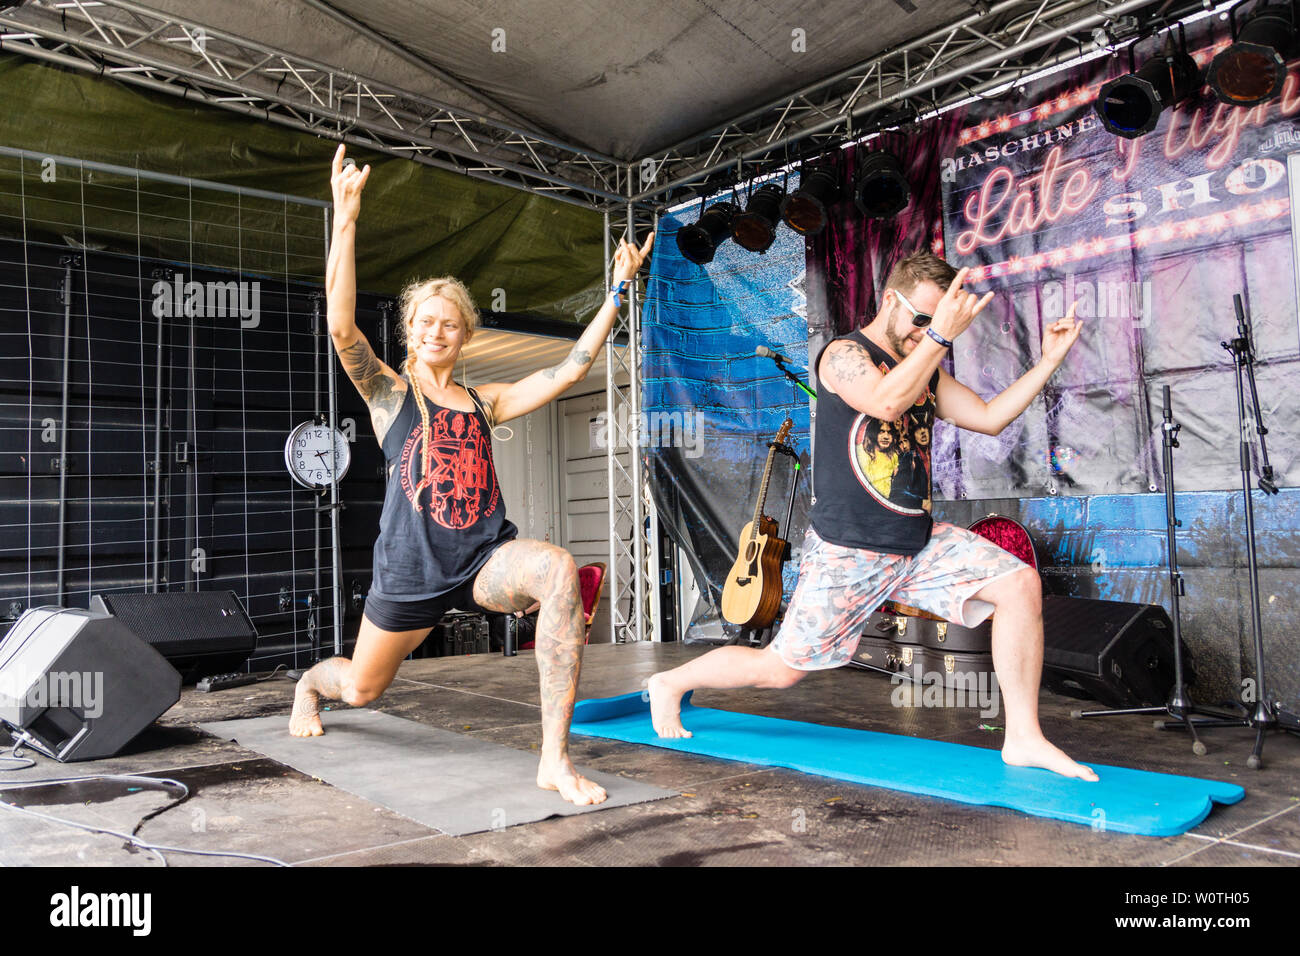 Kiel, Germany - June 16, 2018: Metal Yoga by Saskia Thode on the 2nd Stage in the Radio Bob! Rock Camp during Kiel Week 2018 - Stock Image